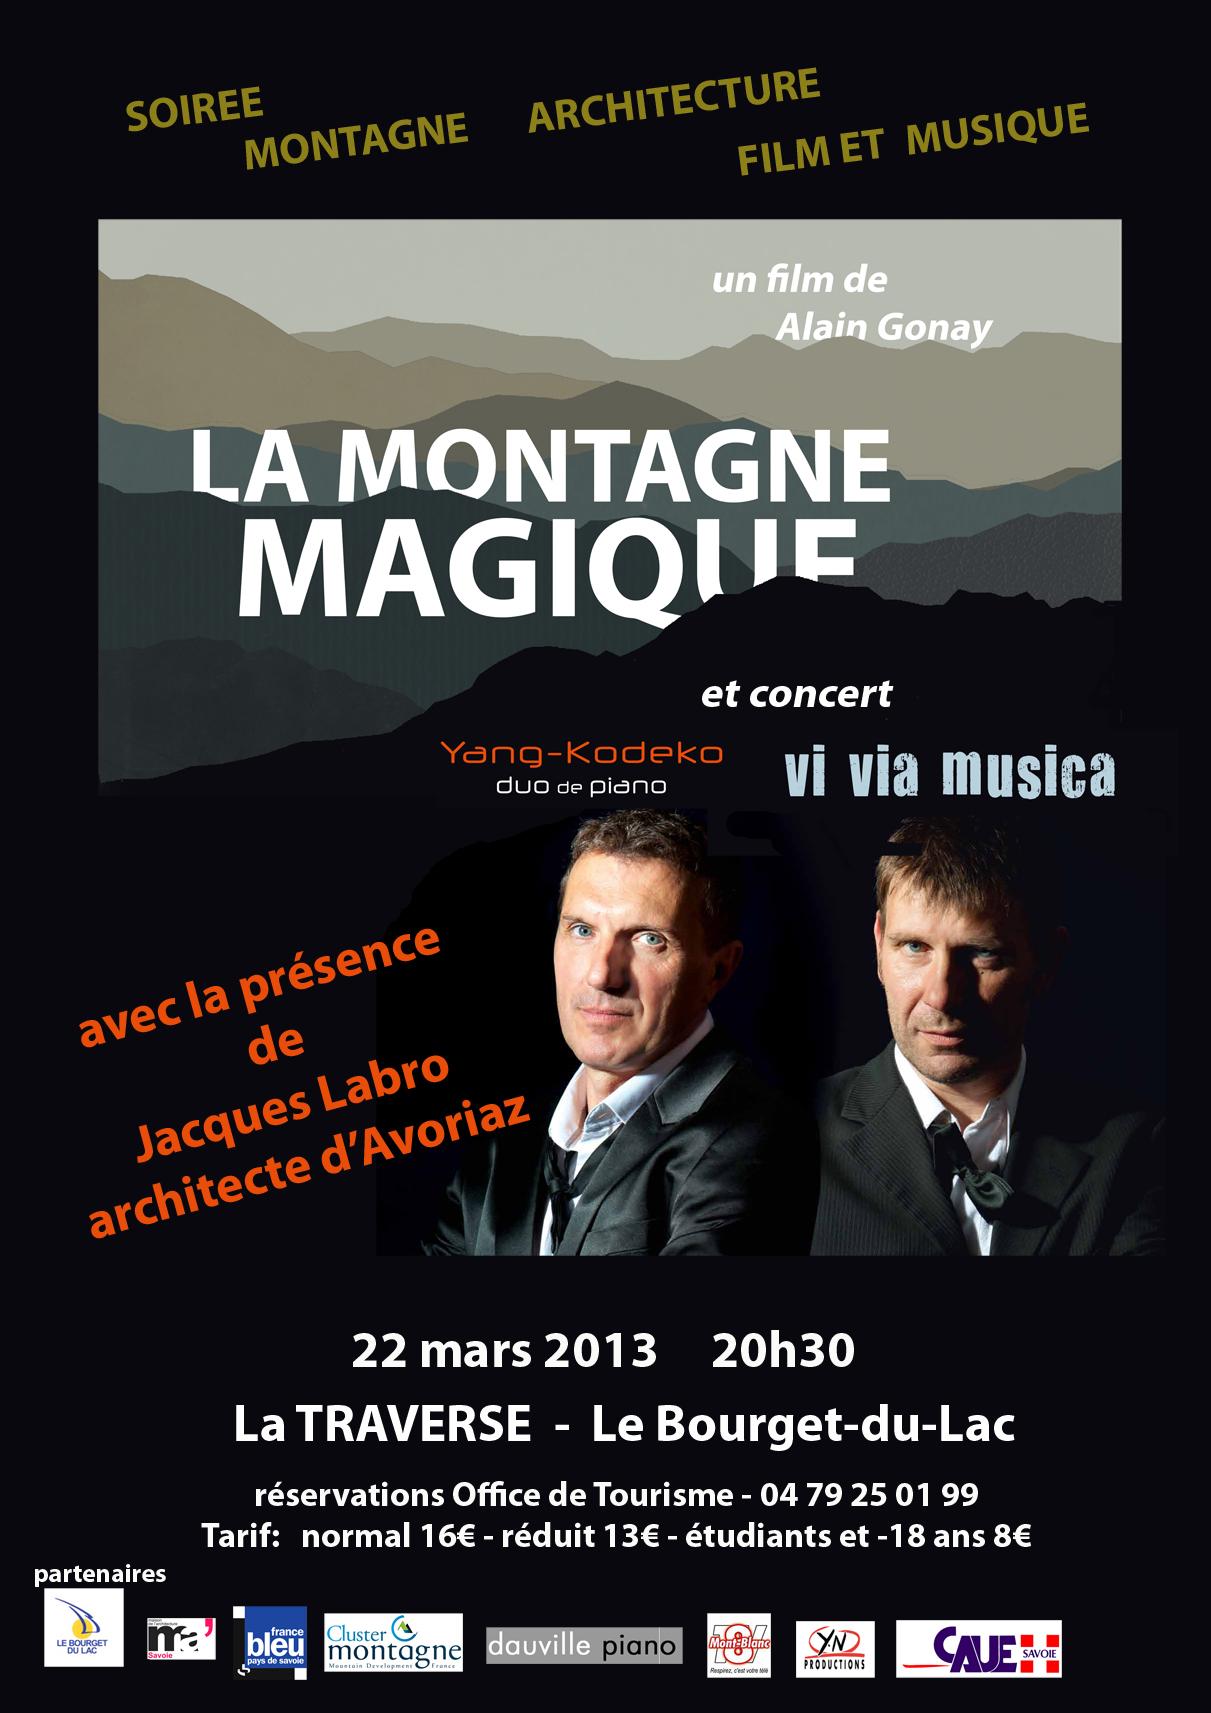 rencontre cinema de montagne 2013